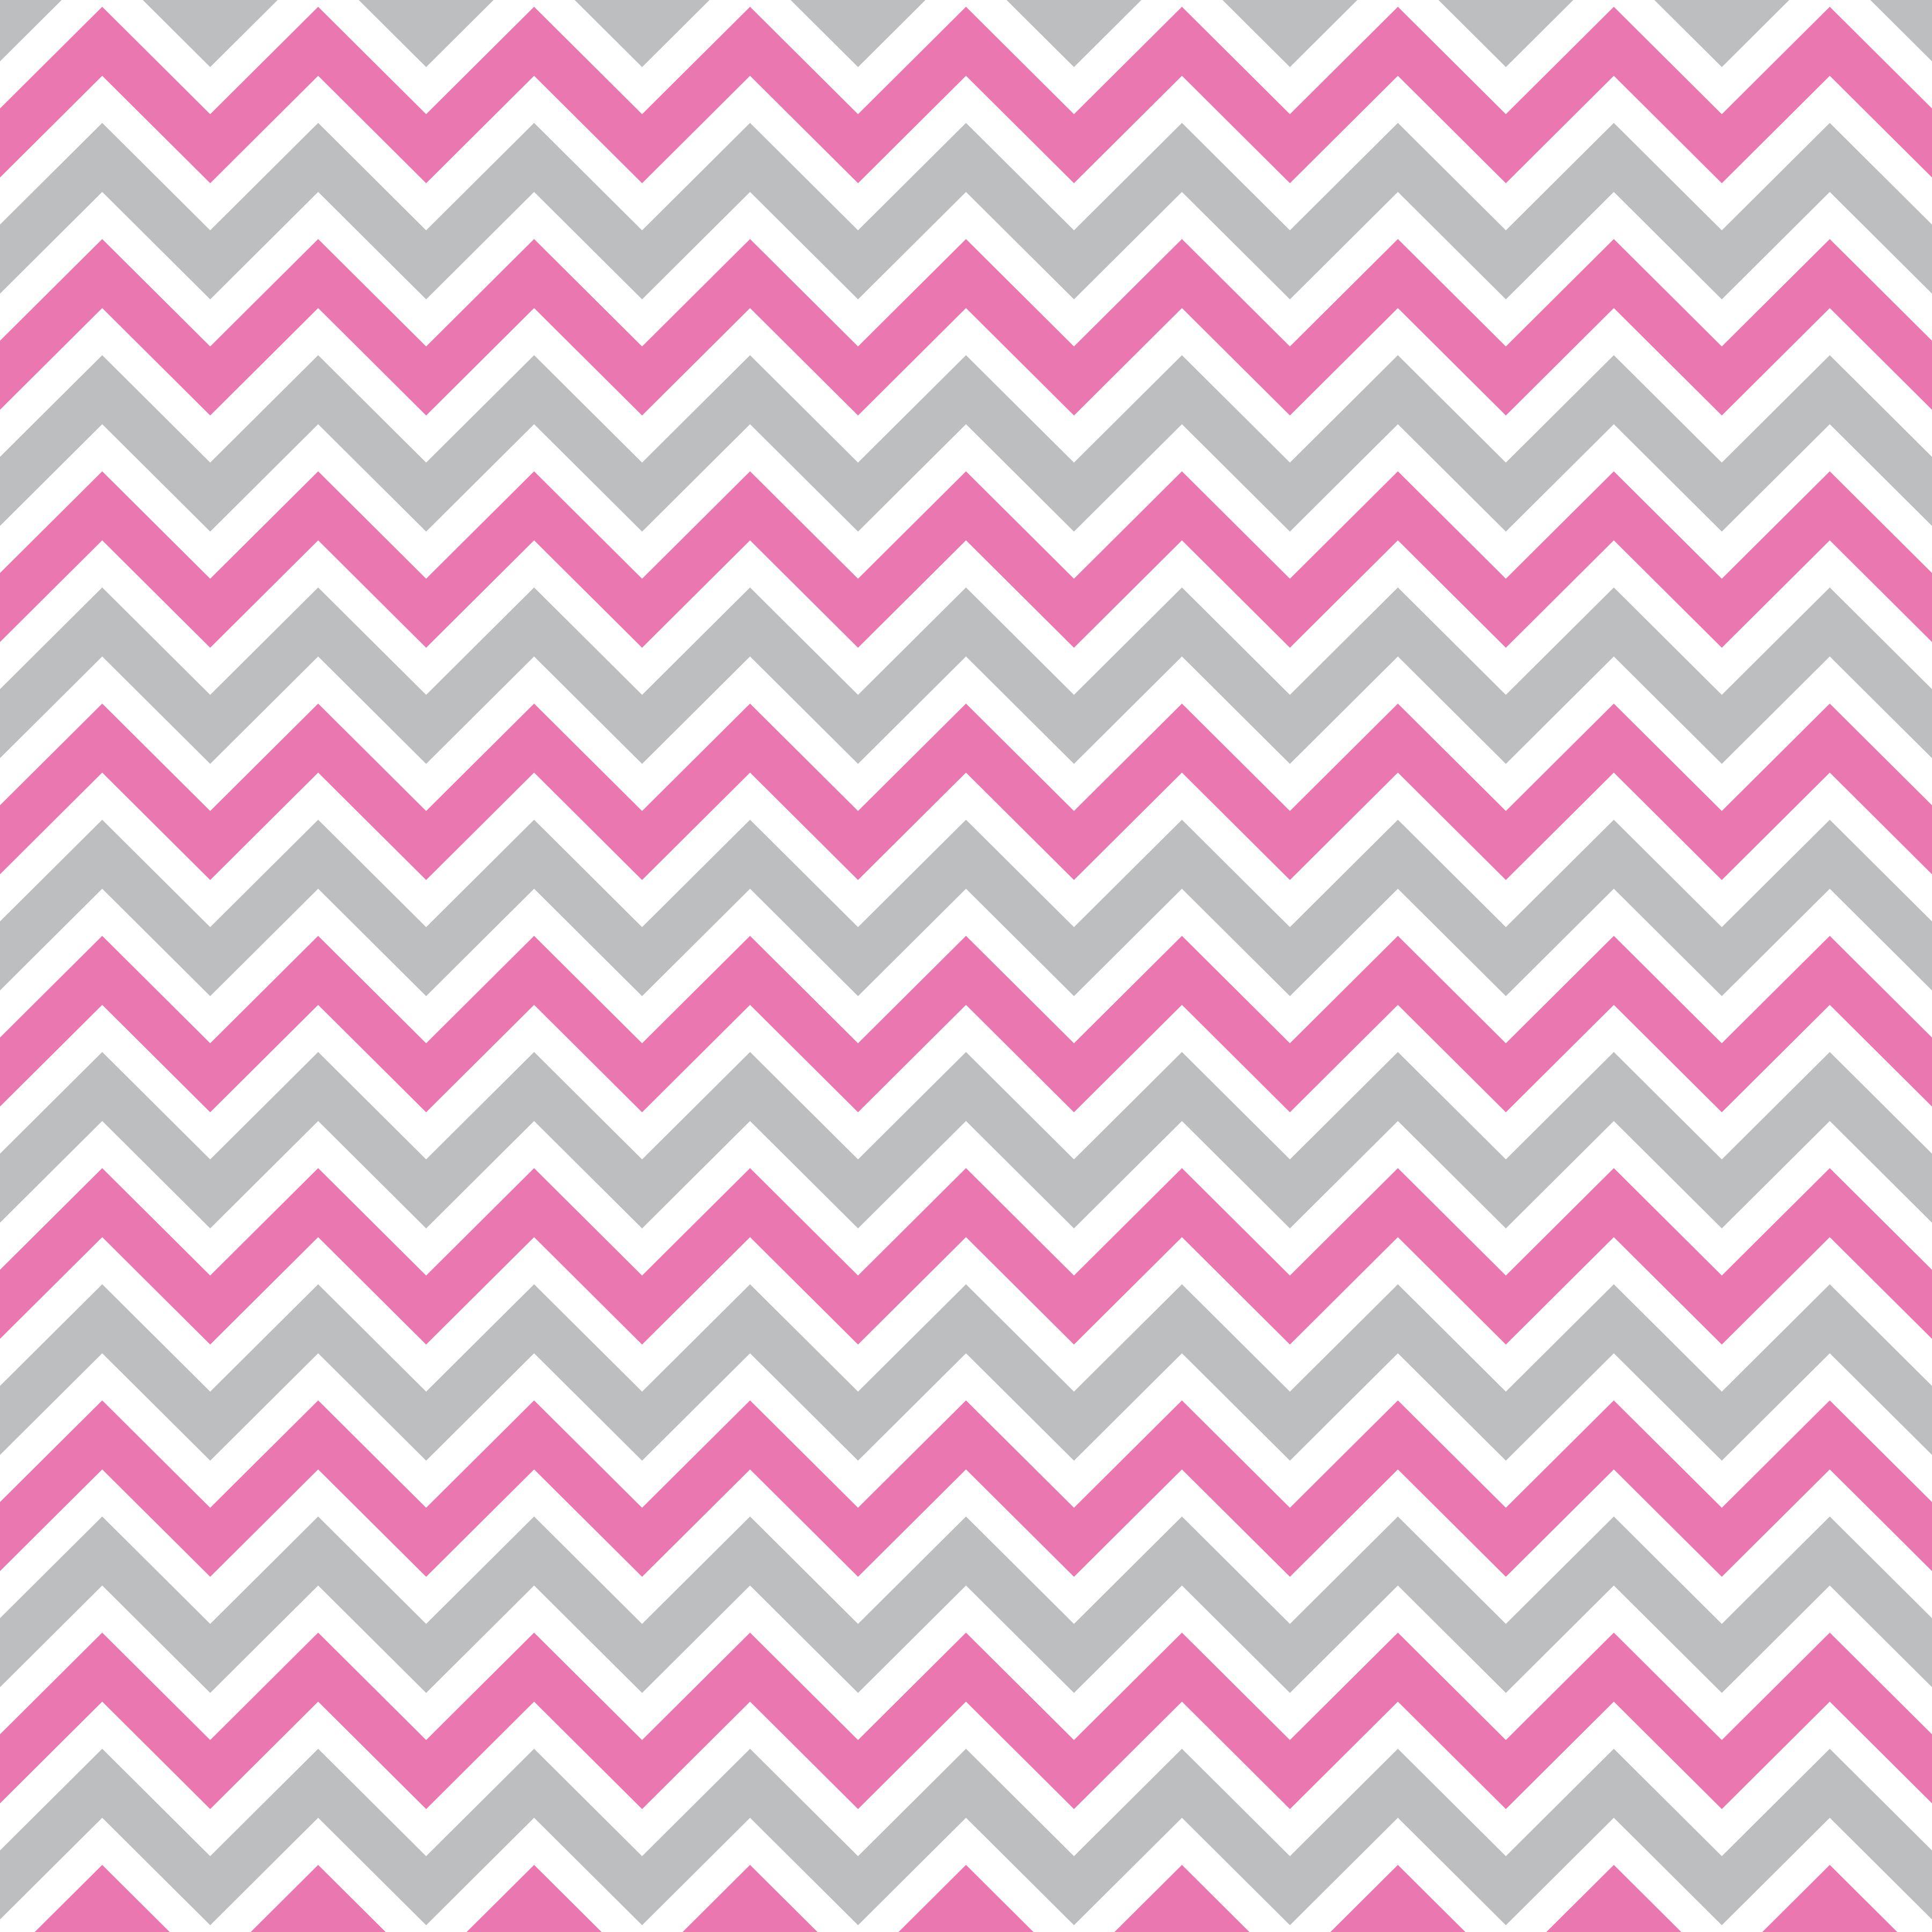 White Gray Pink Chevron Background Wallpaper Lindo Sobres De Papel Empapelado Rosa